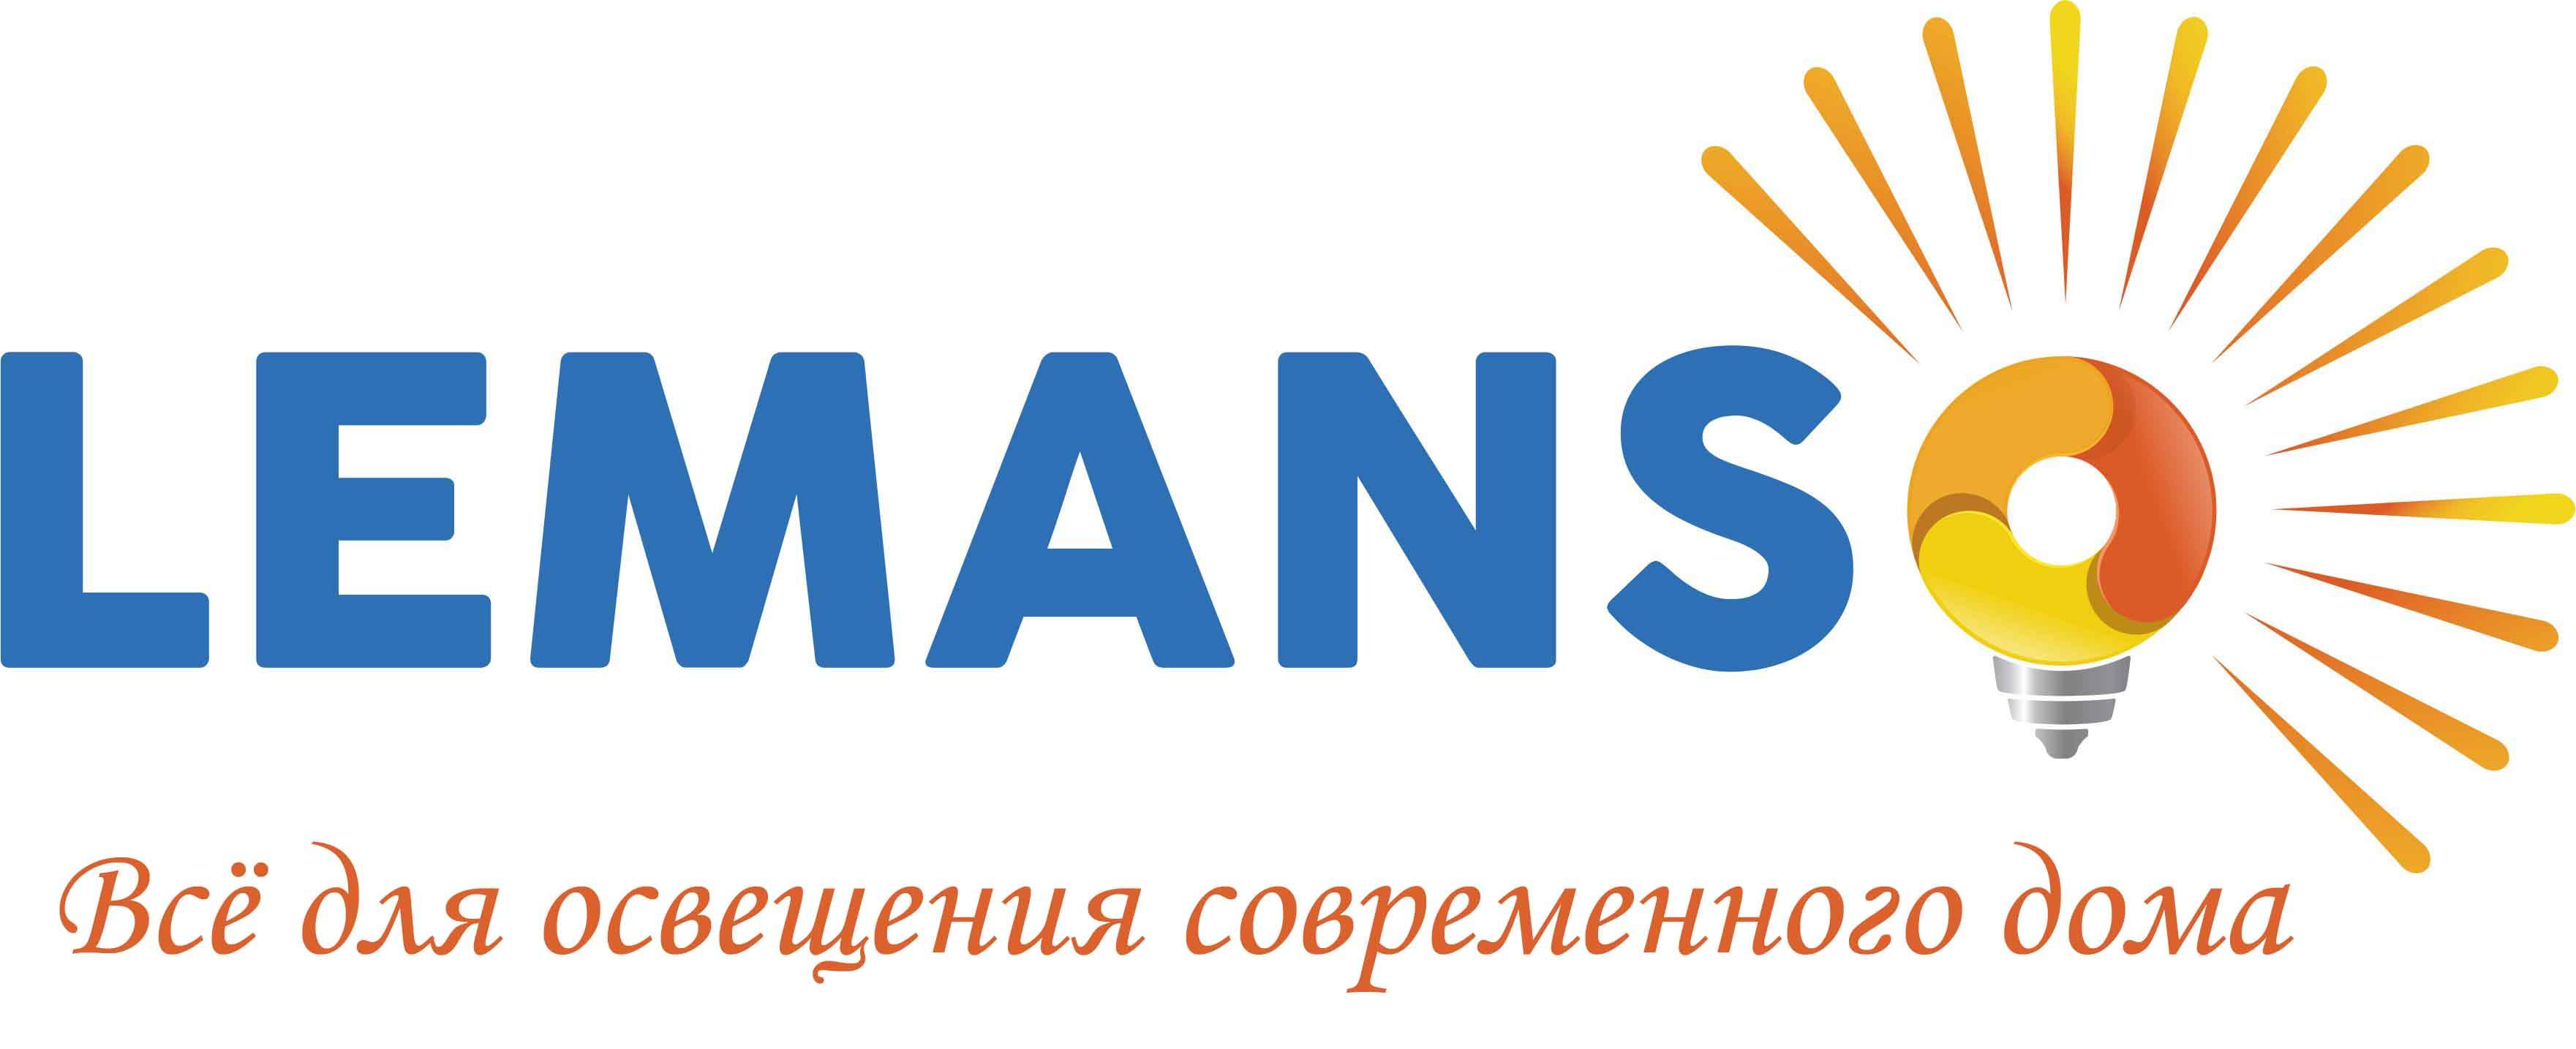 Интернет-Магазин Lemanso